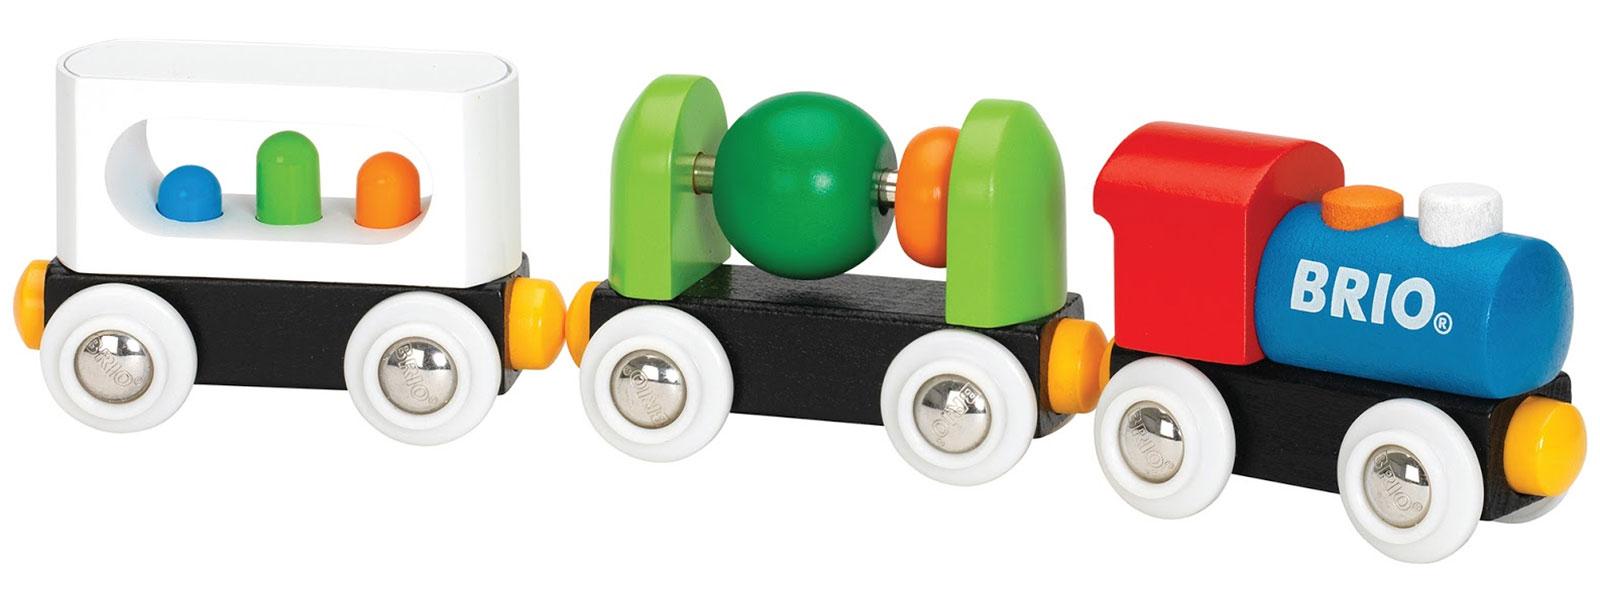 mon premier circuit train b b brio b b jouet en bois circuit train neuf ebay. Black Bedroom Furniture Sets. Home Design Ideas